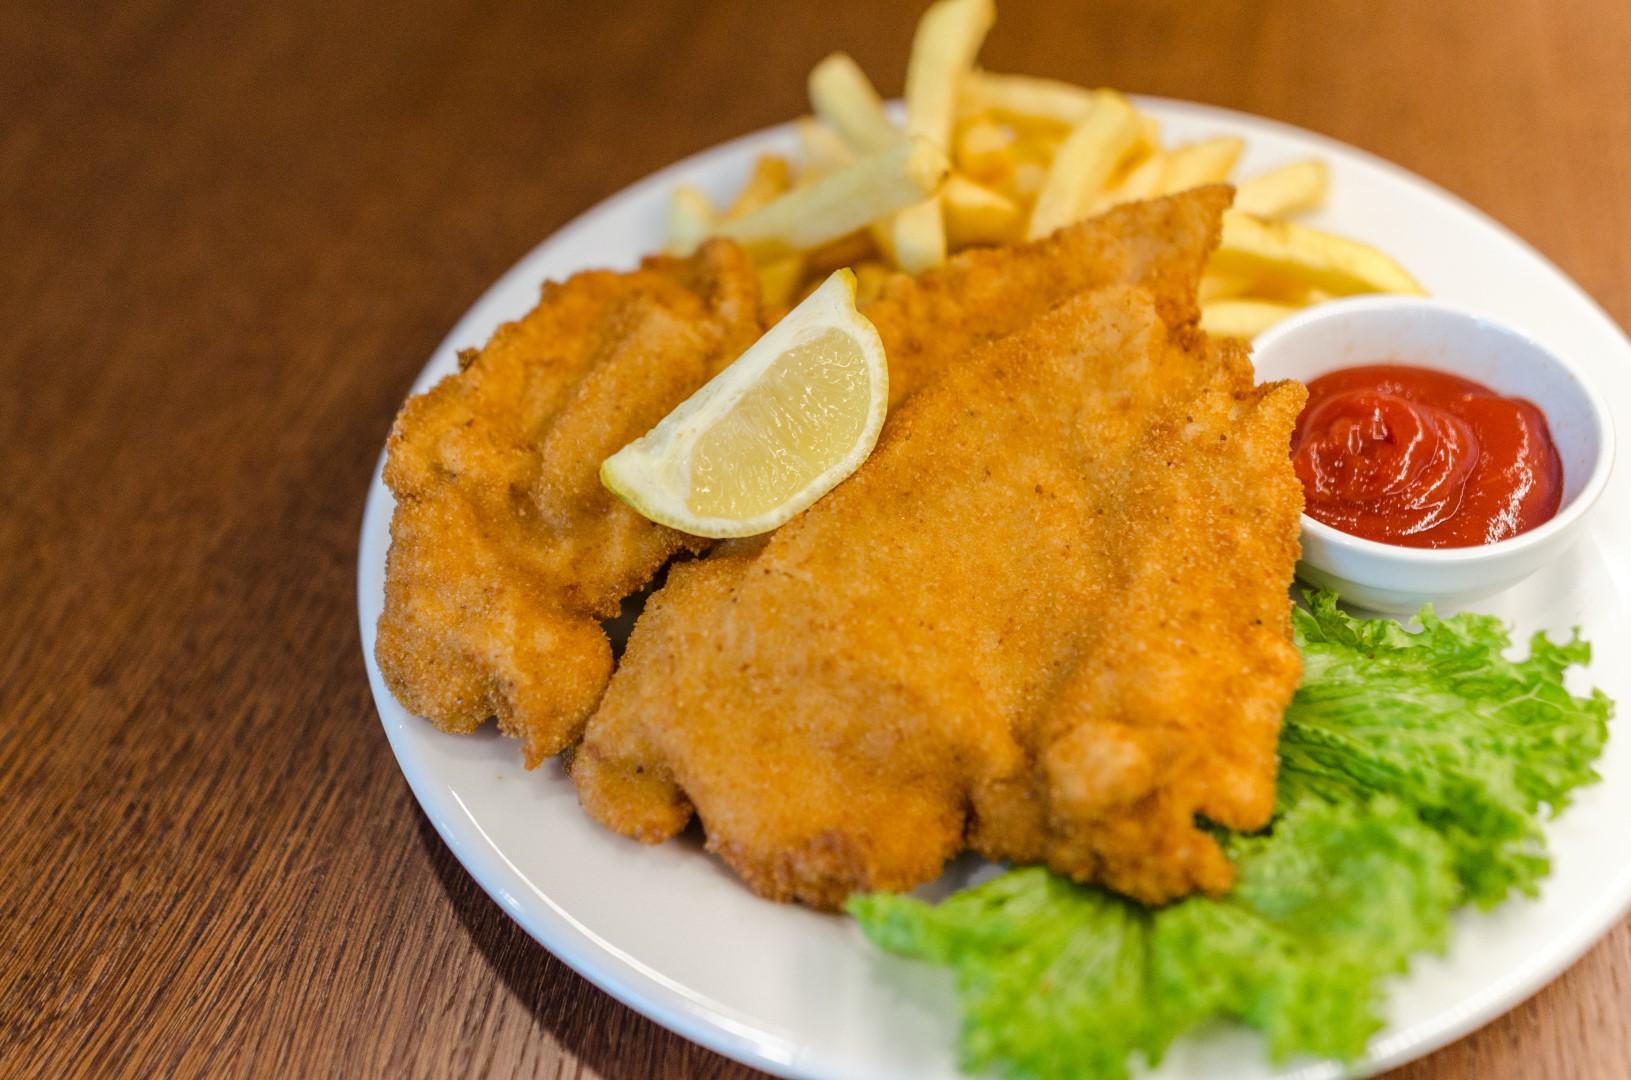 german food popular: Schnitzel